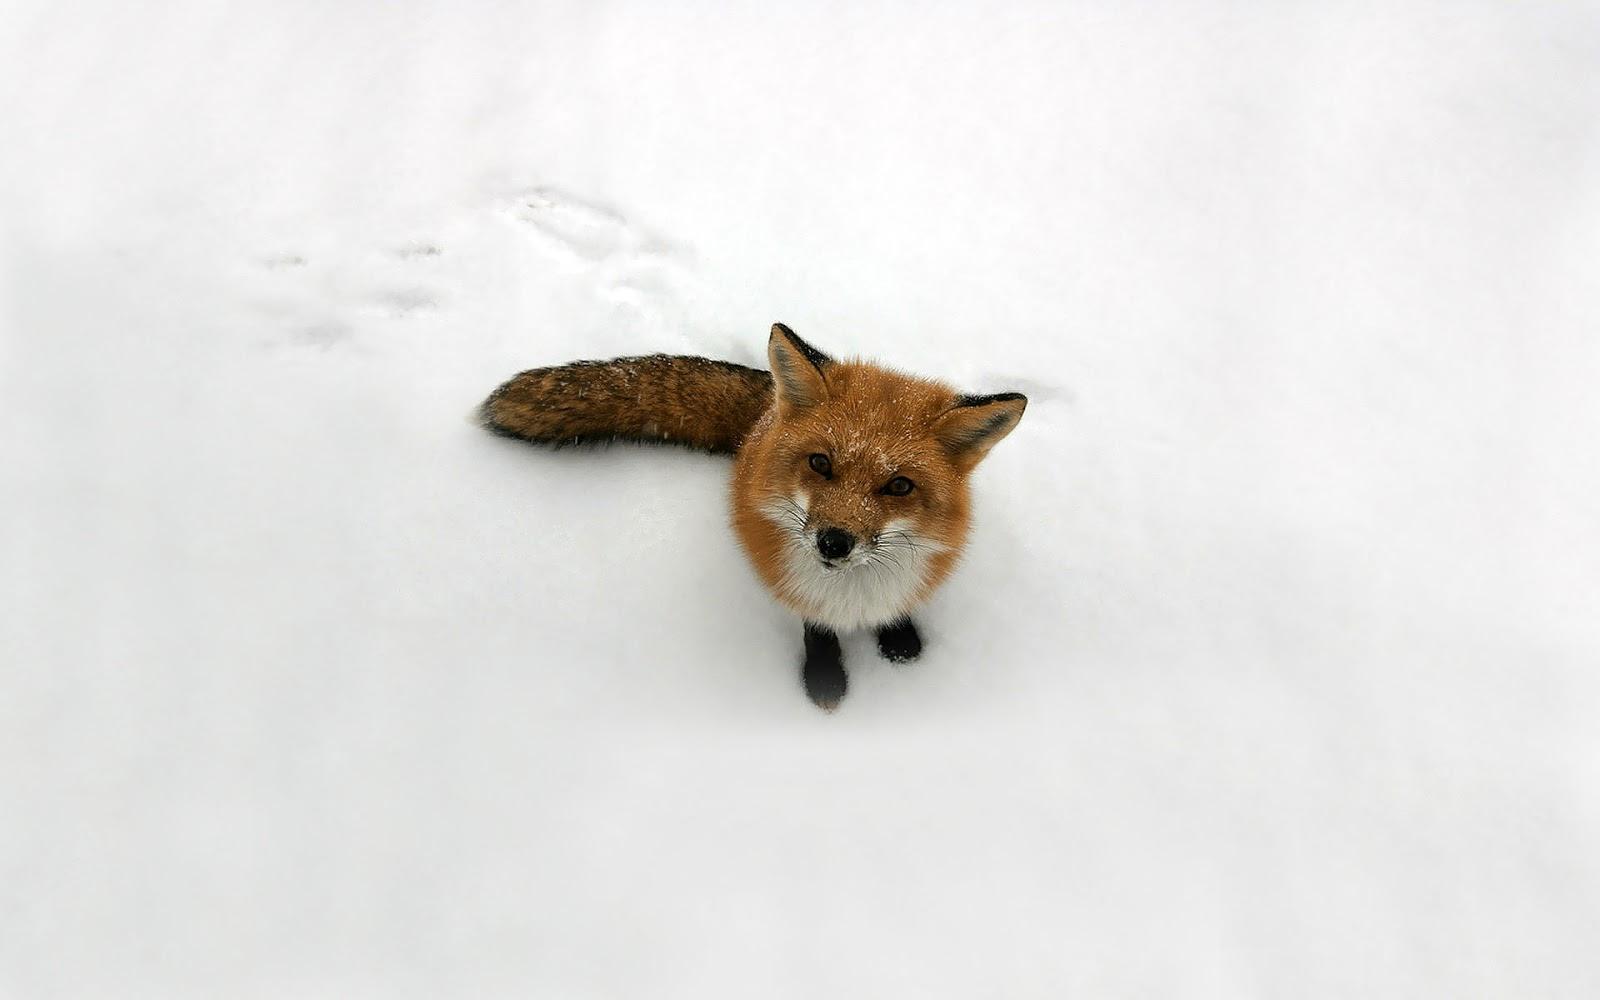 [img width=5024 height=340]http://2.bp.blogspot.com/-NeqqOvdh8sY/UHcpoJvhpNI/AAAAAAAAGZ8/_NukA5od1m4/s1600/dieren-wallpaper-met-een-rode-vos-in-de-sneeuw.jpg[/img]